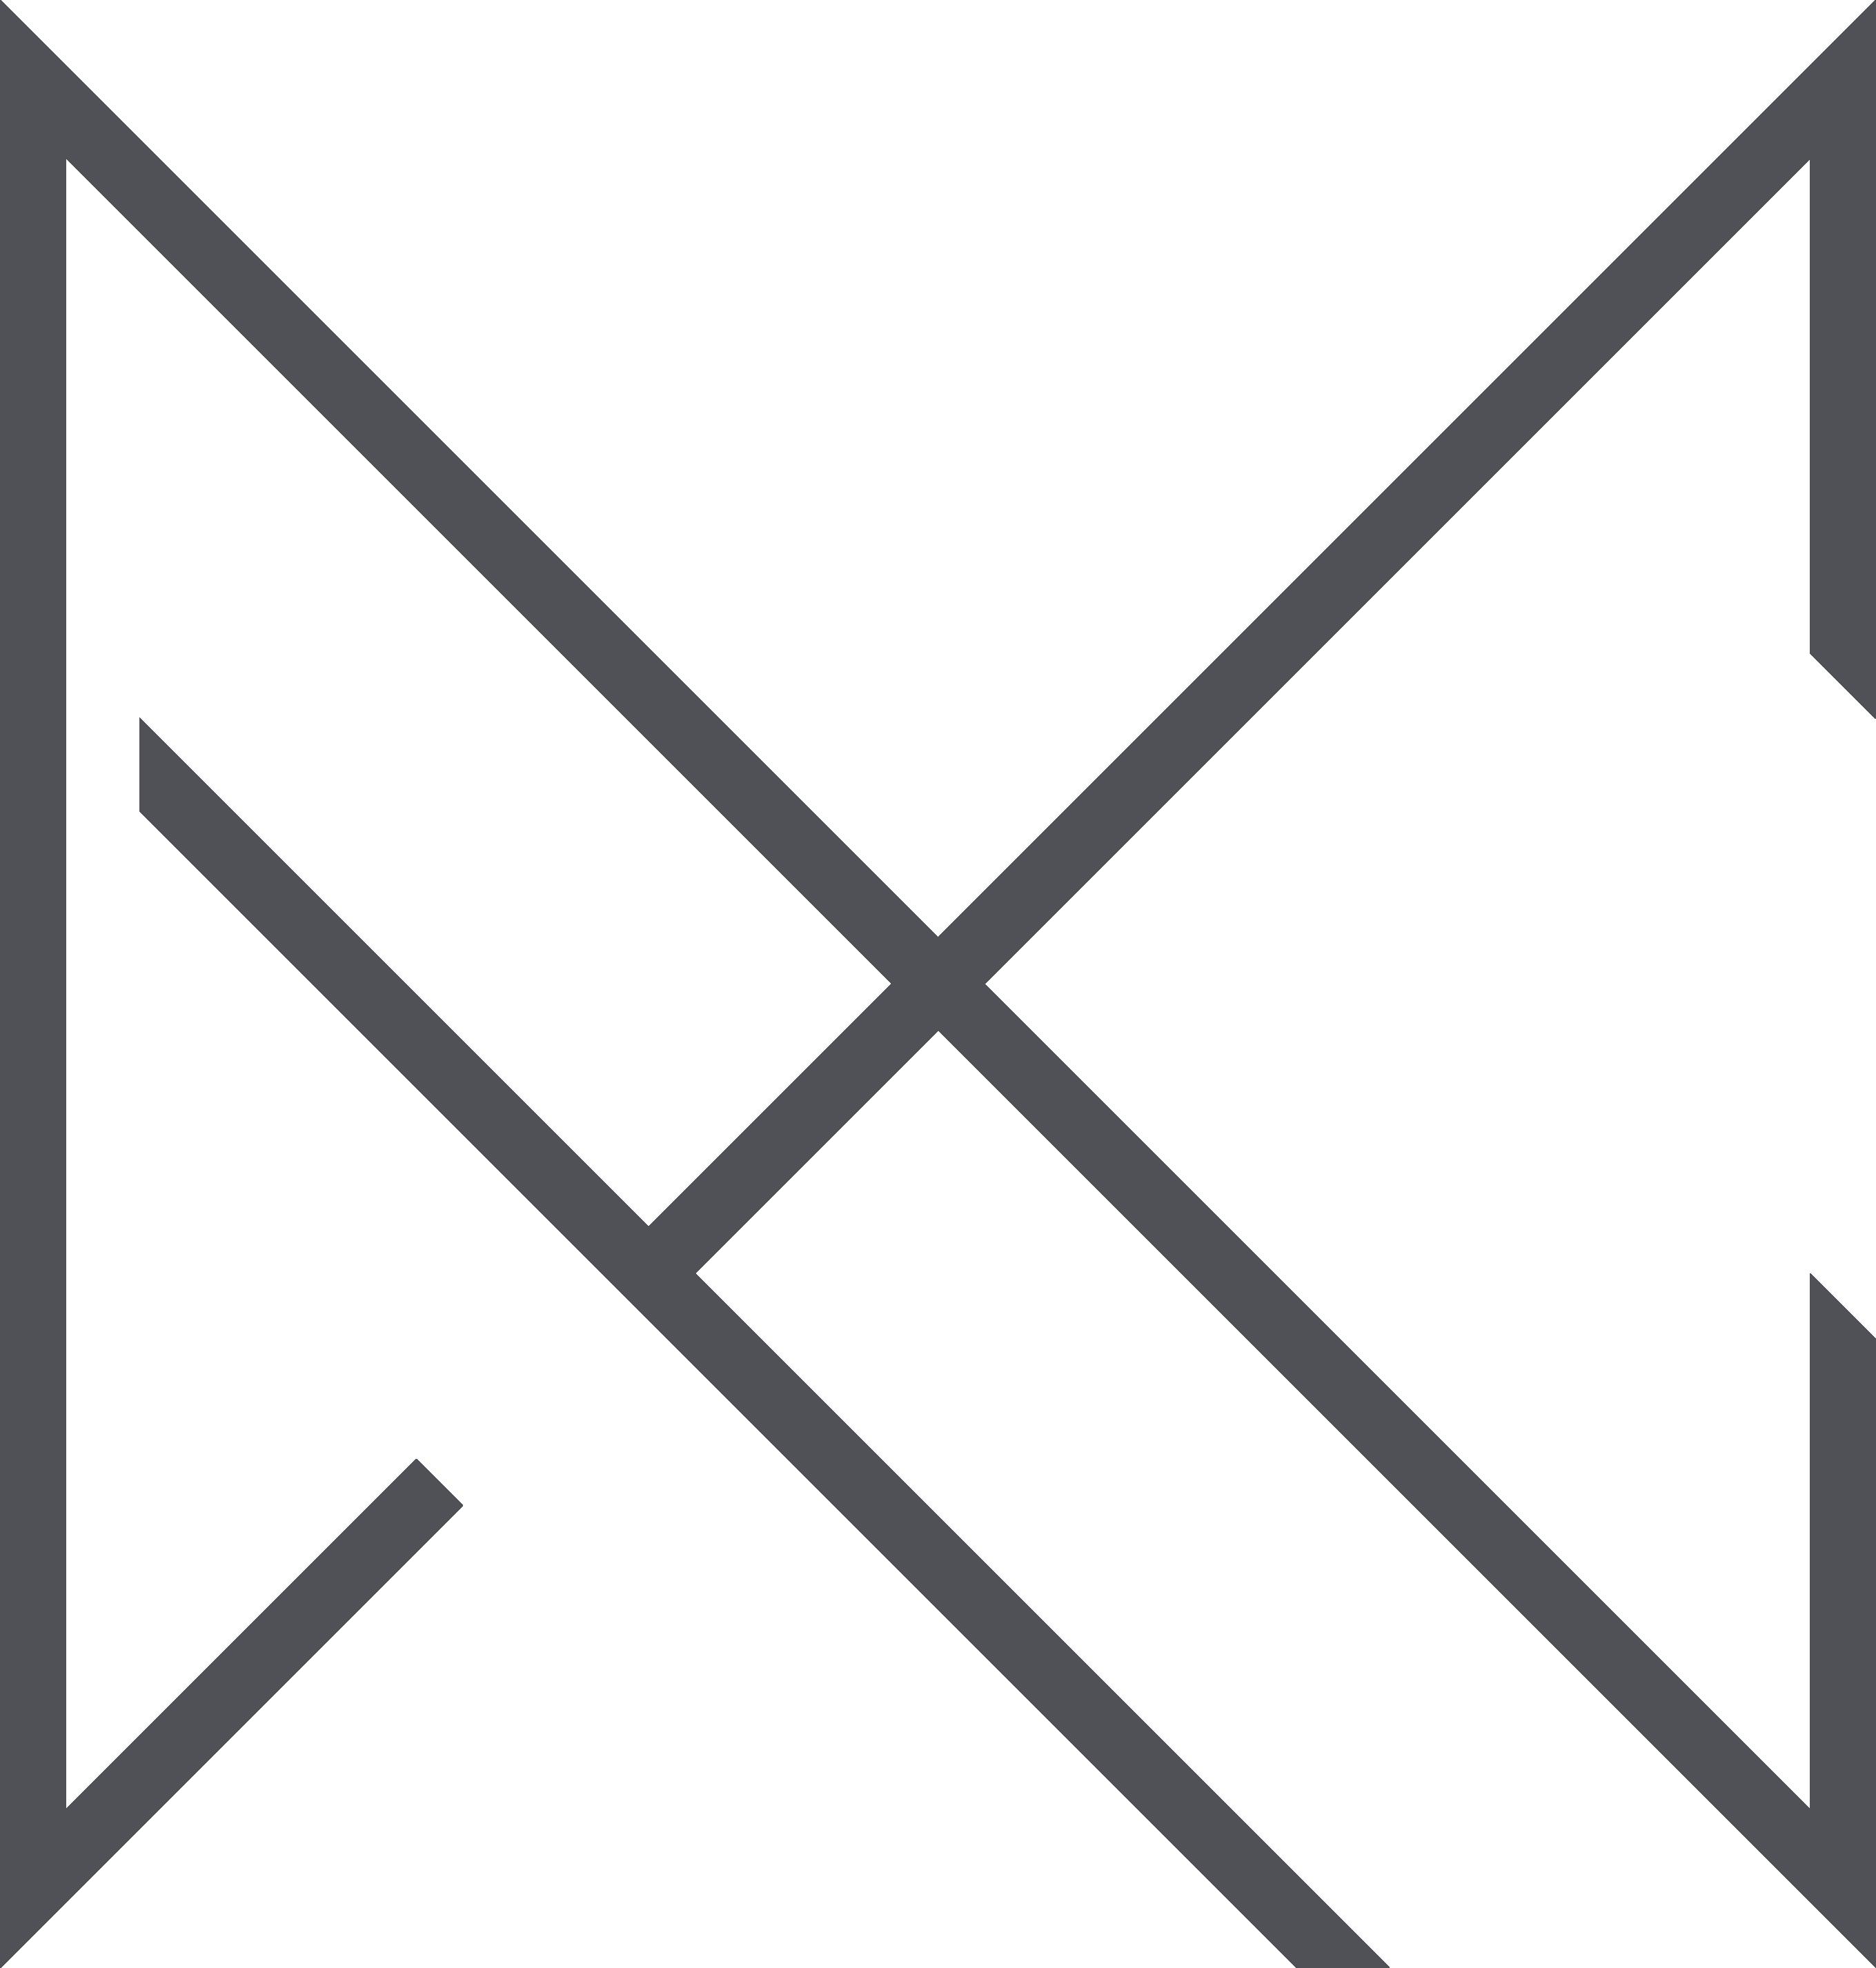 Design a modern + authoritative logo of my name